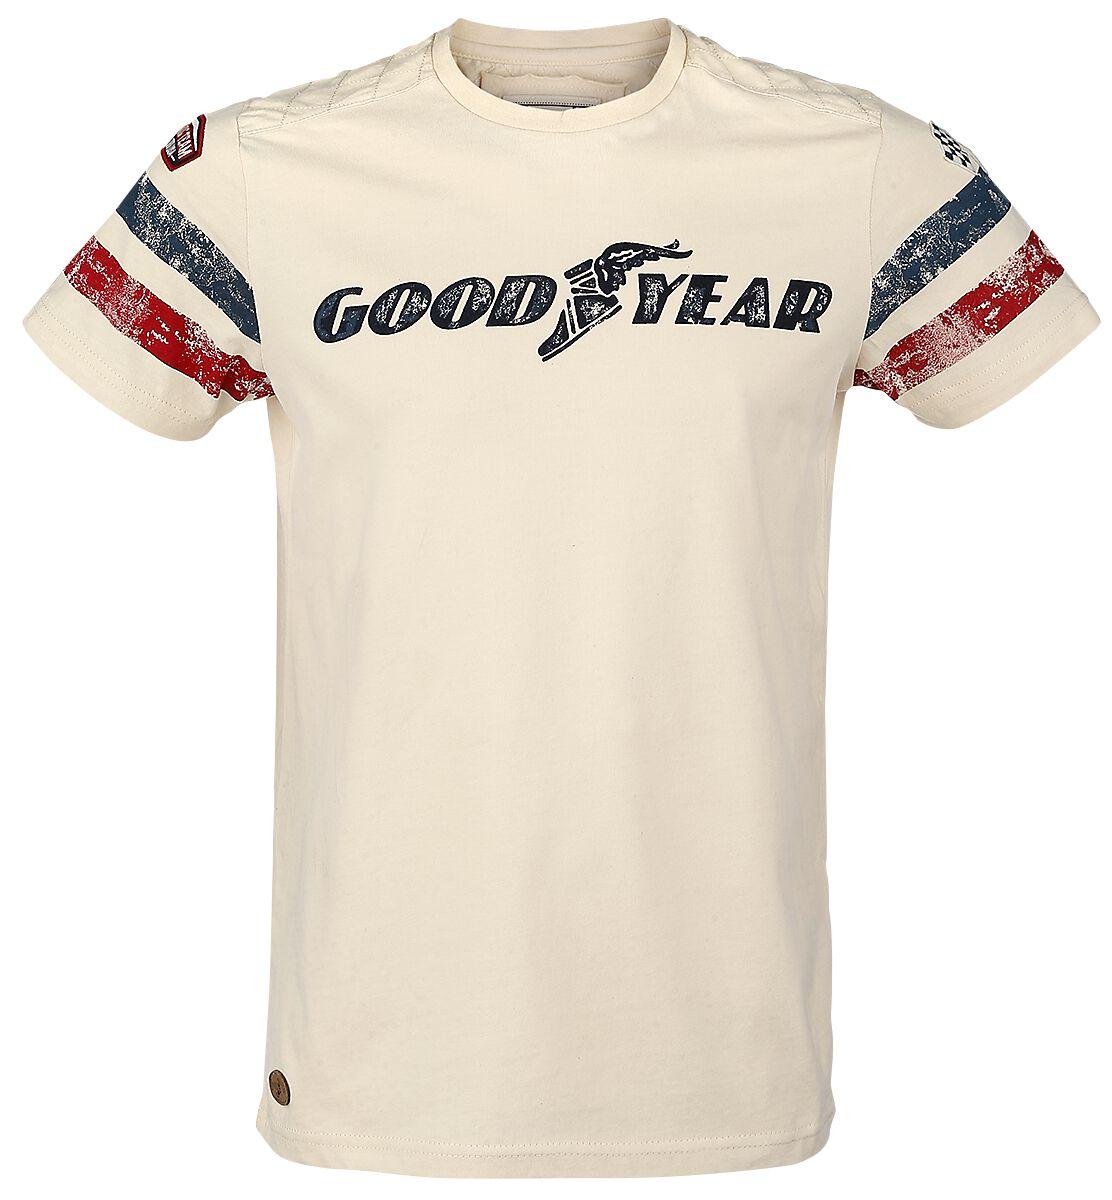 Marki - Koszulki - T-Shirt GoodYear Grand Bend T-Shirt beżowy - 298224